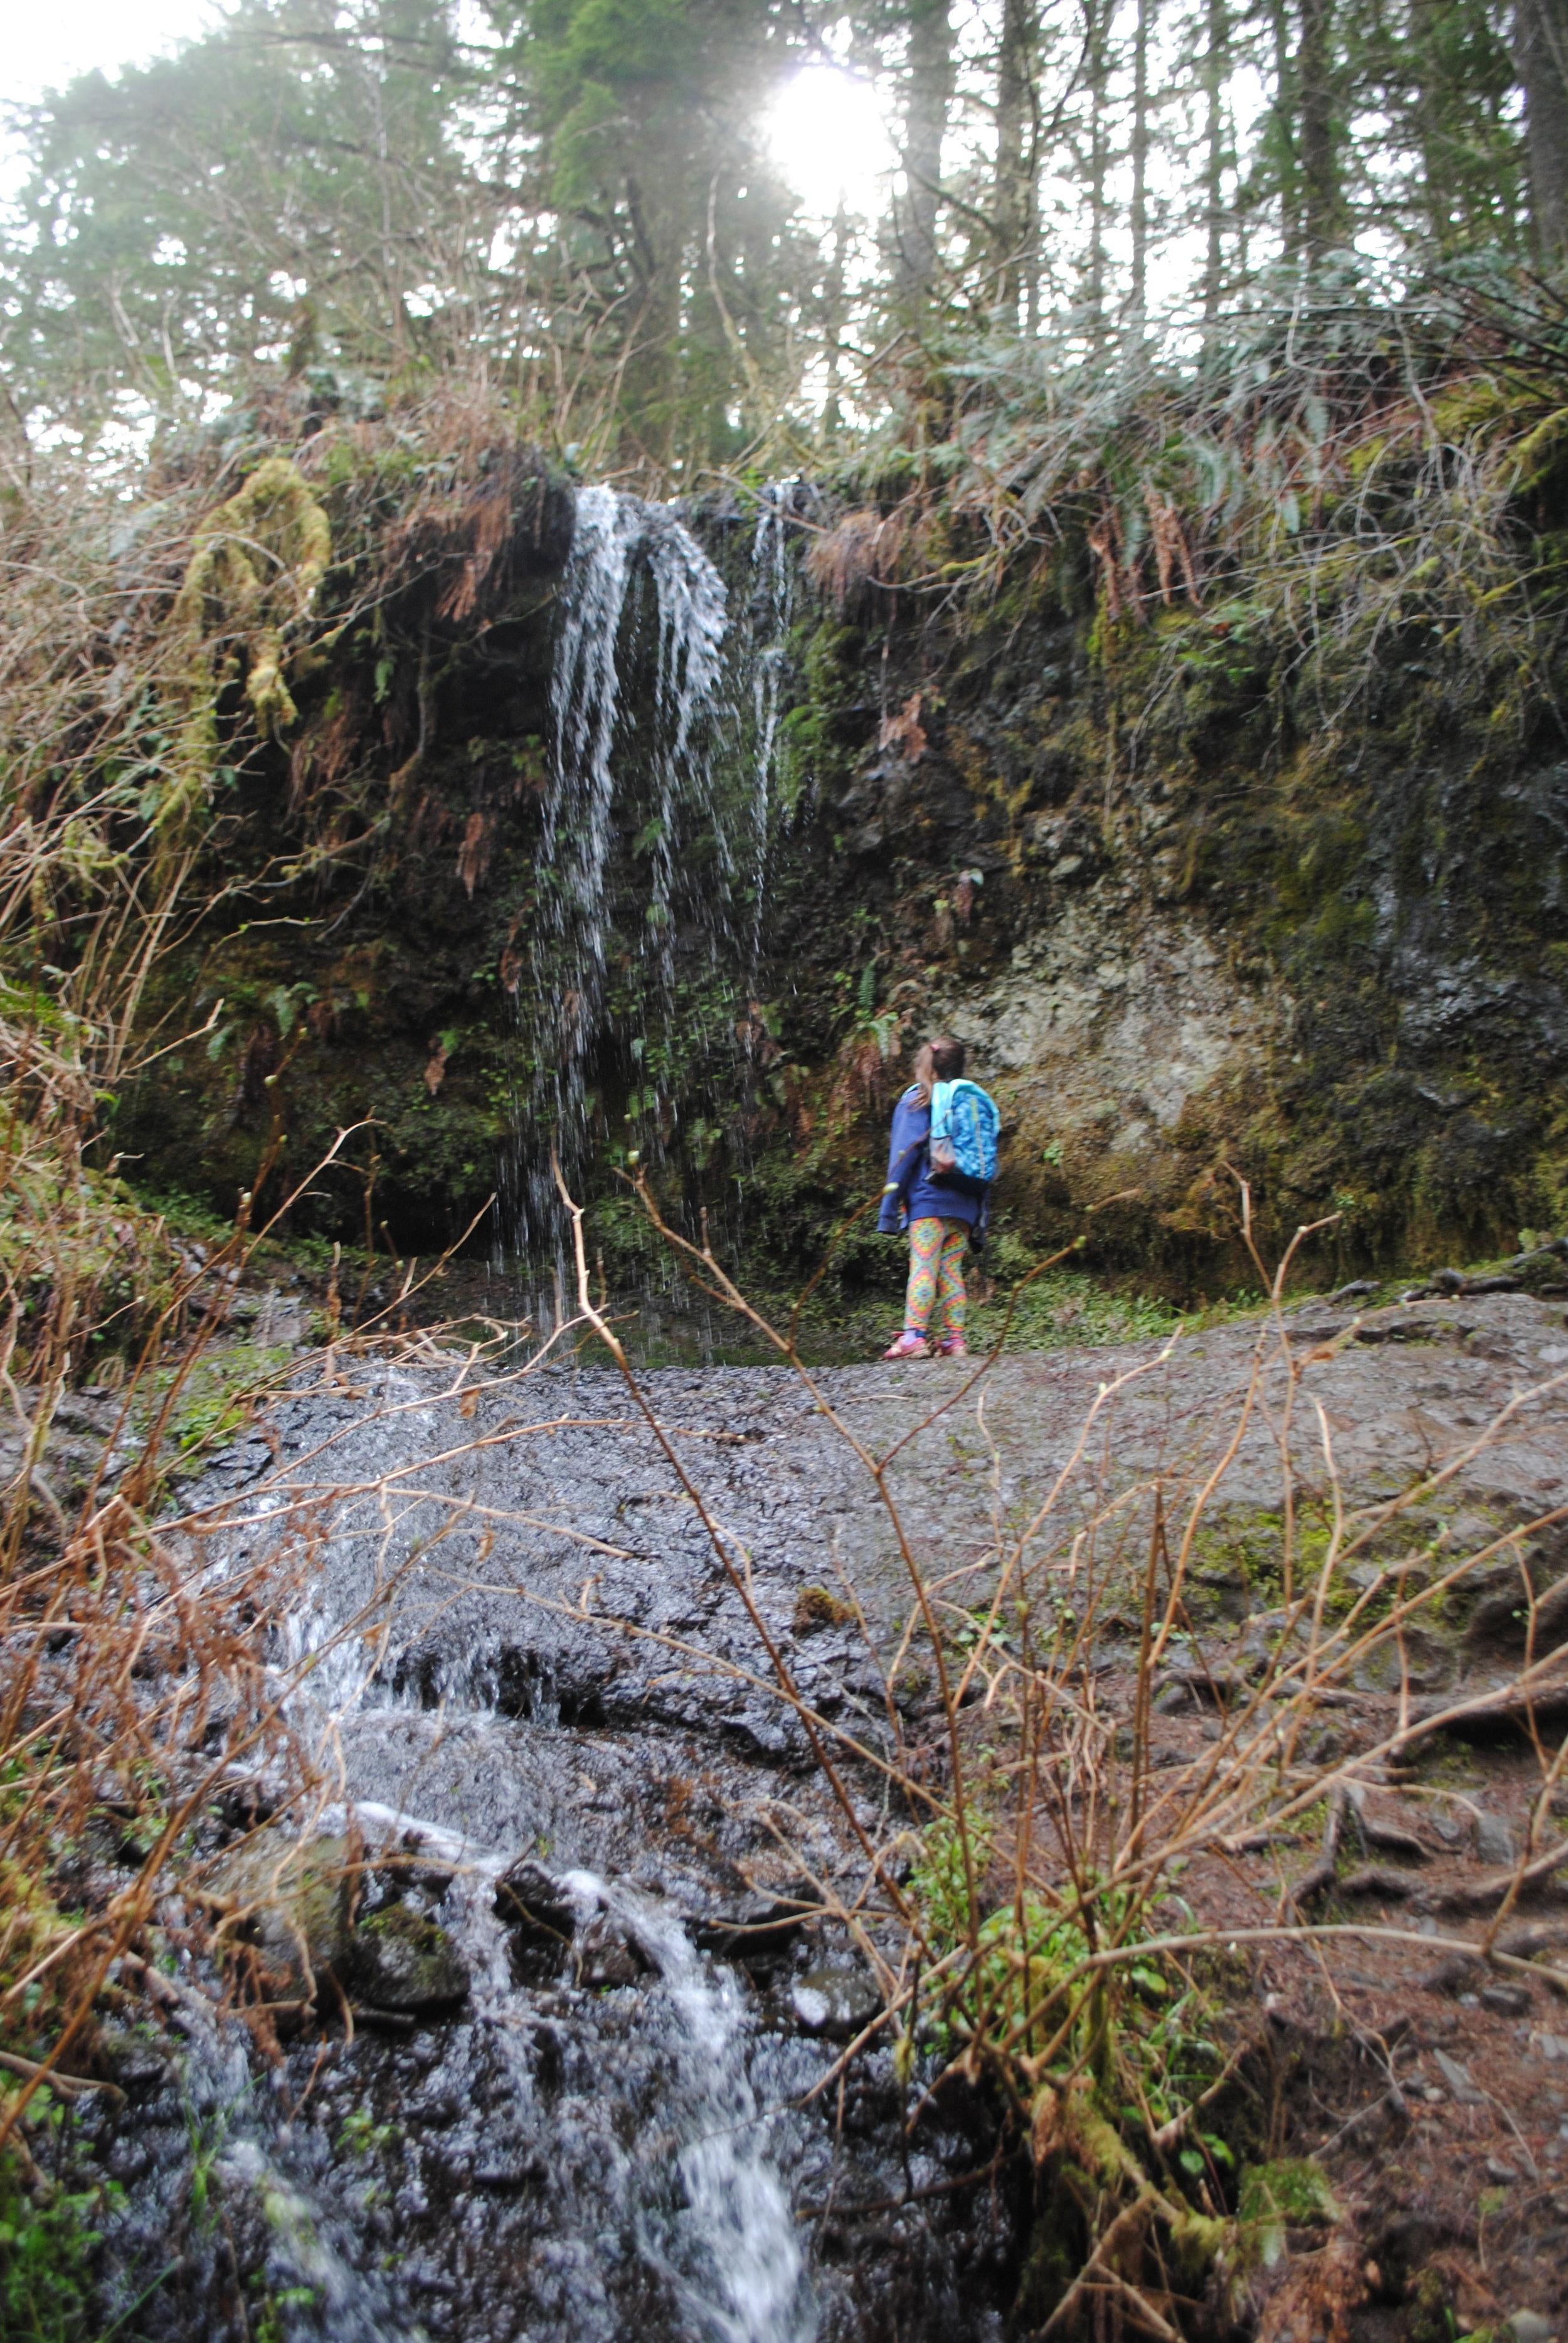 SILVER FALLS STATE PARK - Upper North Falls - Oregon